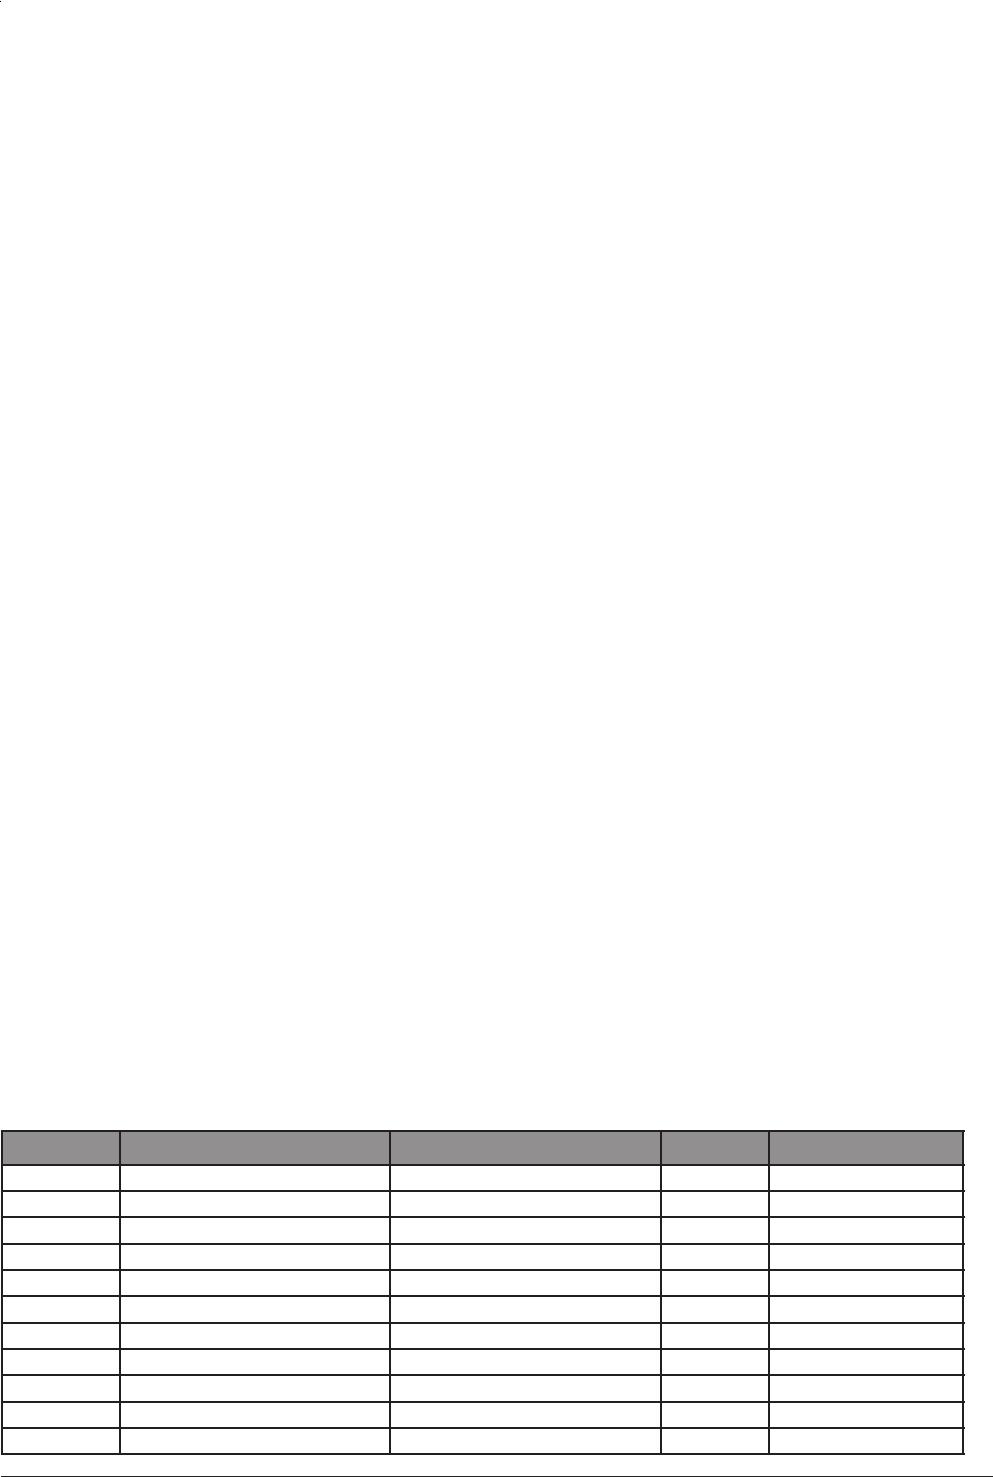 Handleiding Huvema HU 30 TI (pagina 18 van 28) (Deutsch)